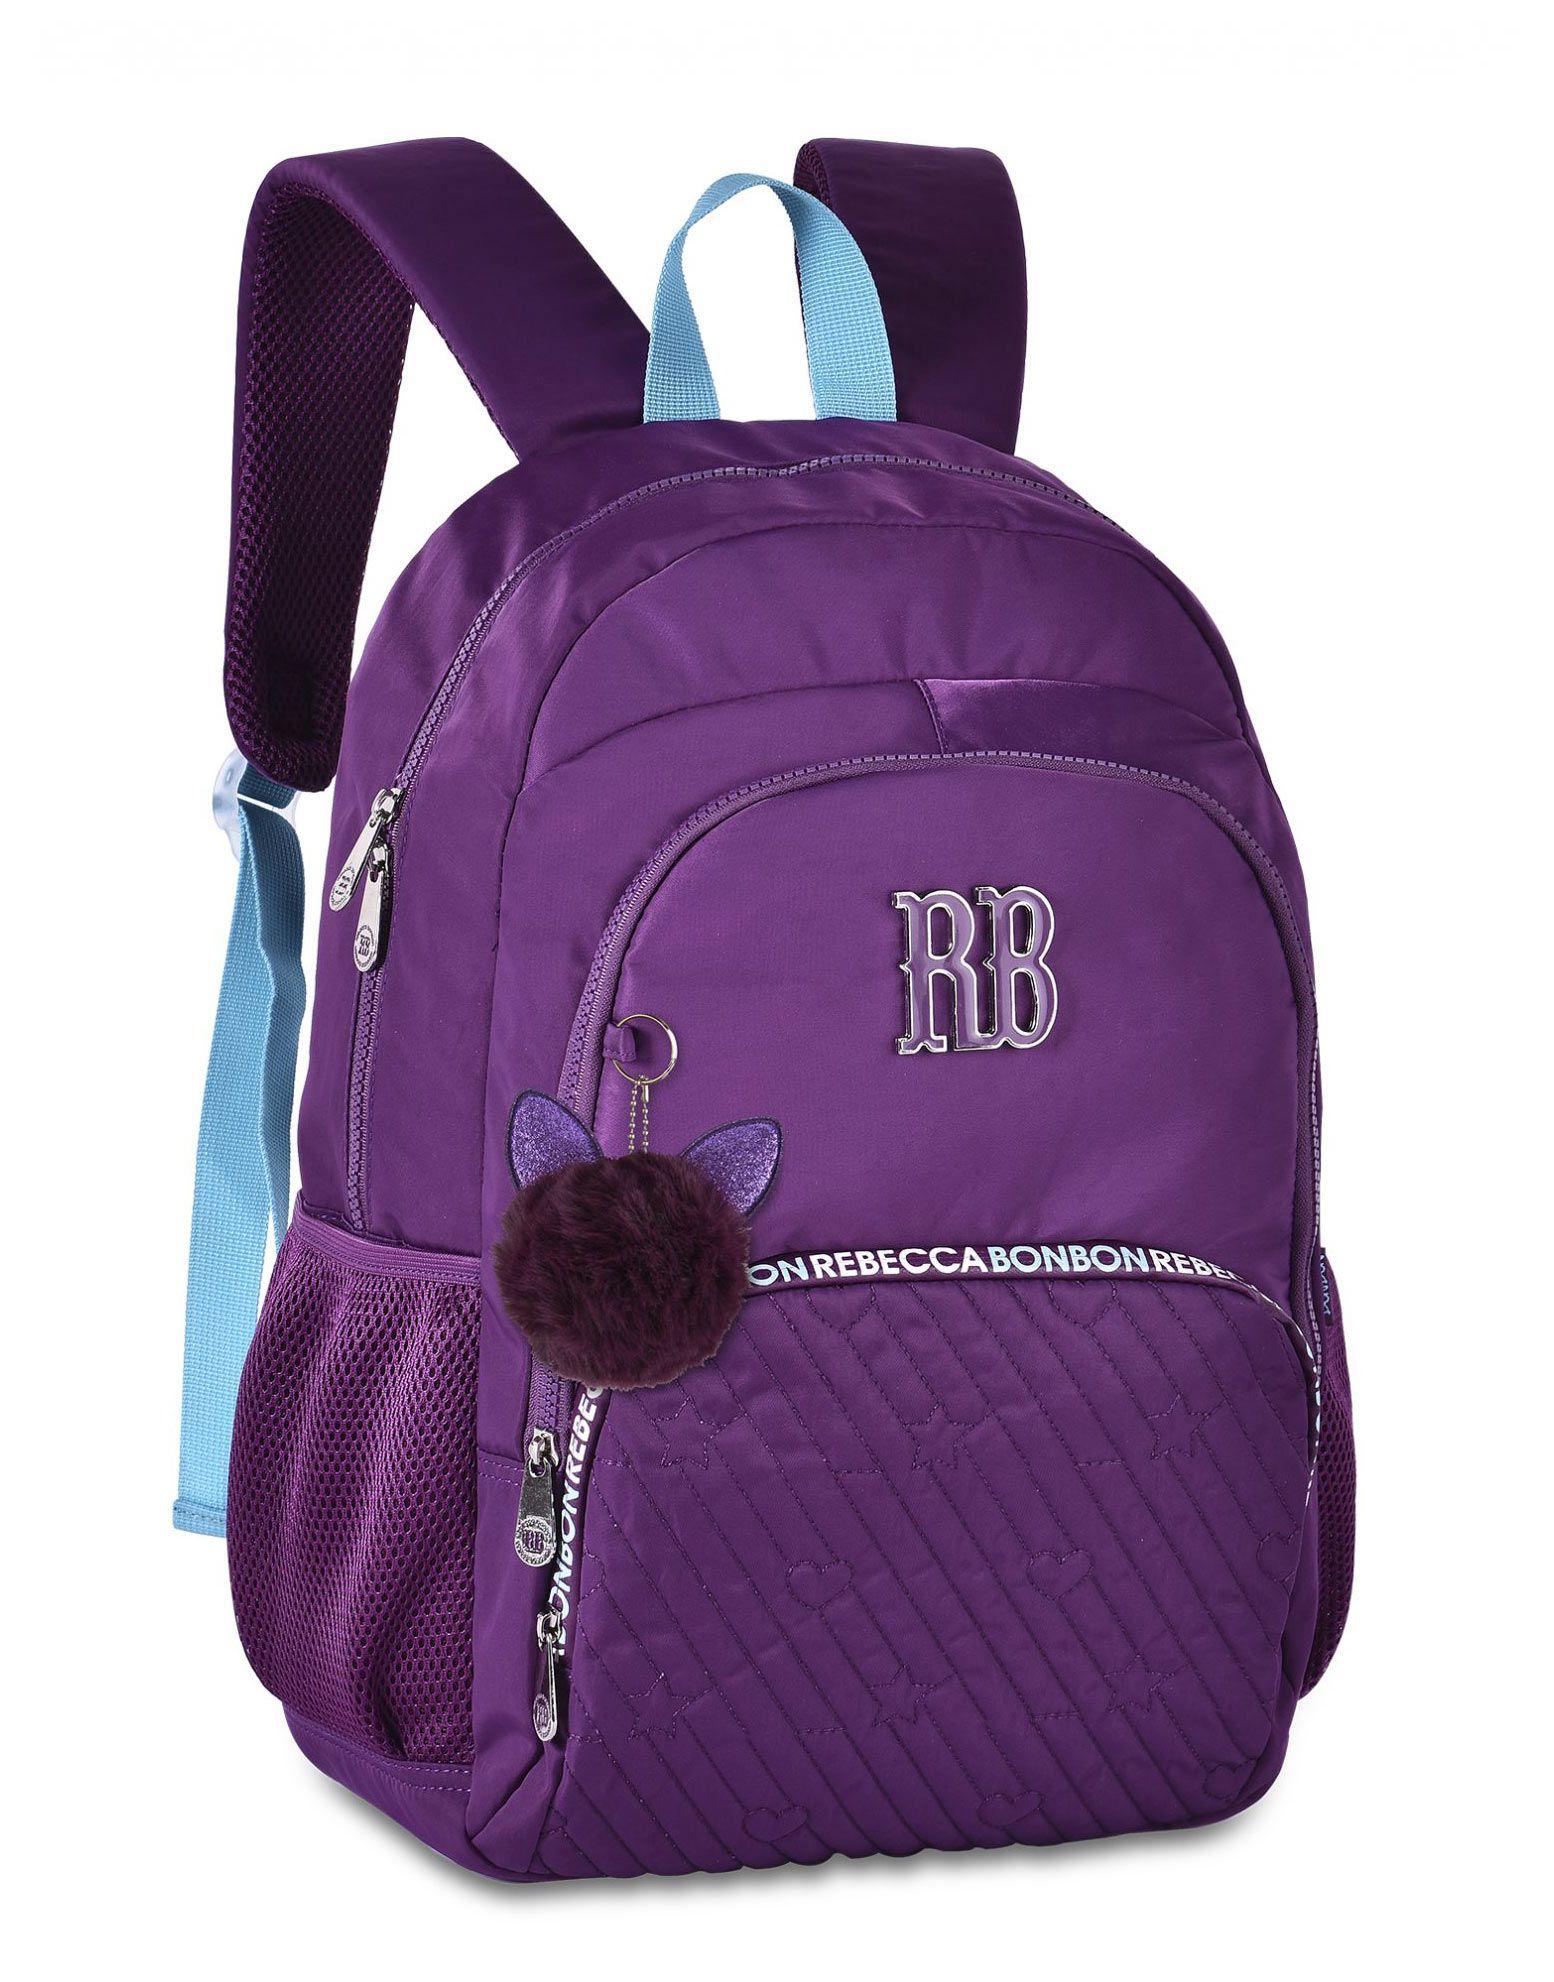 Mochila Escolar Universitária Juvenil Rebecca Bonbon RB2060